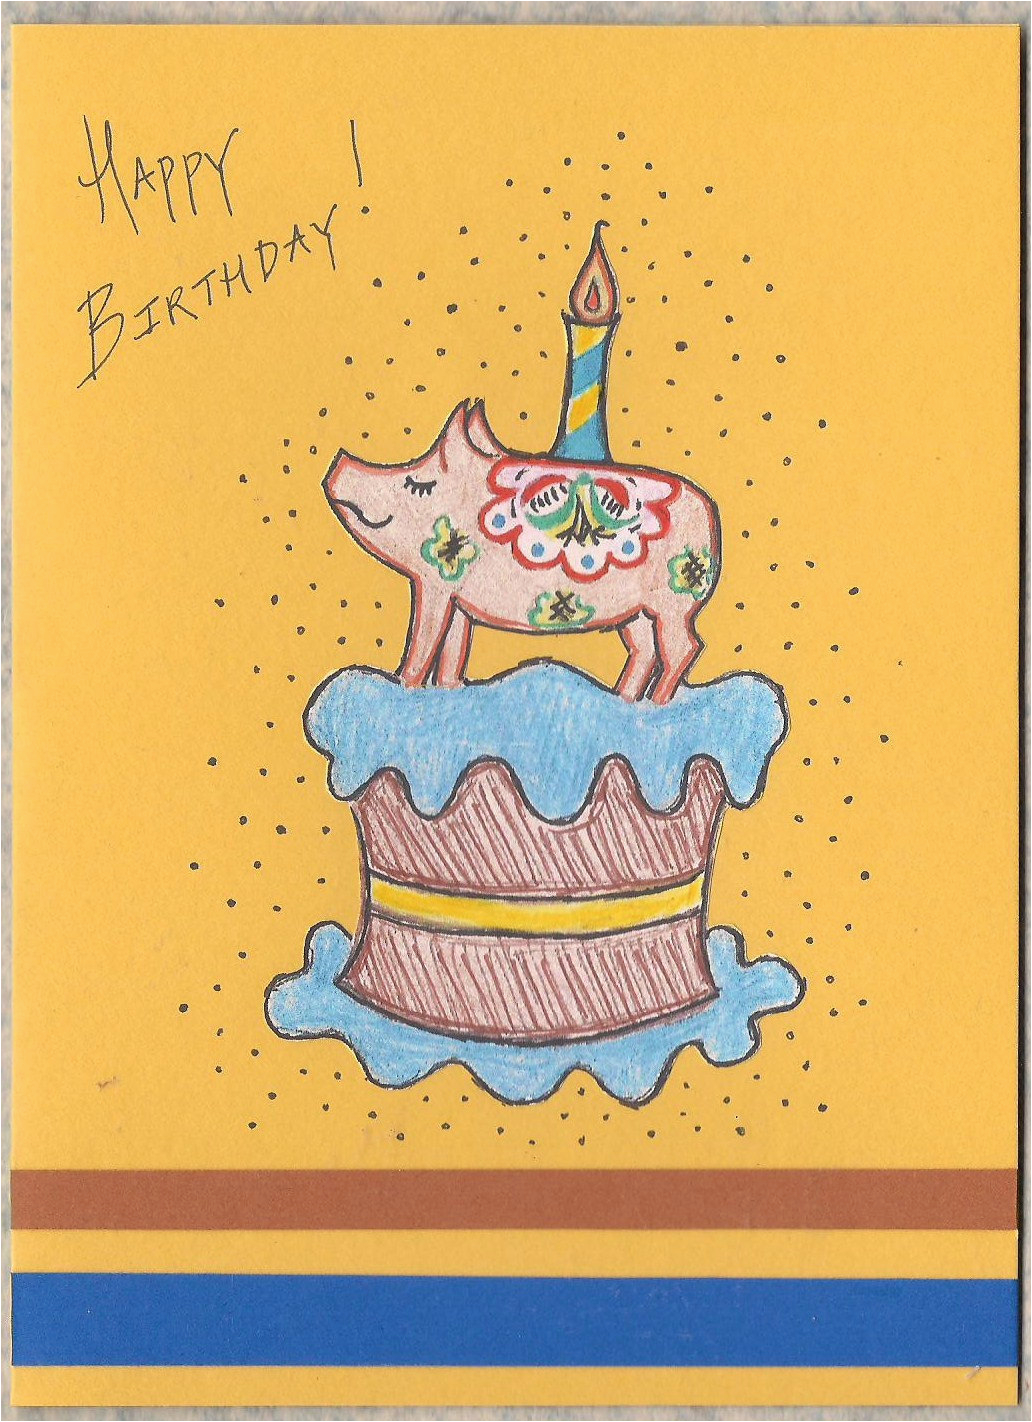 Swedish Birthday Card Swedish Pig Birthday Card Swedish Birthday Vintage Style